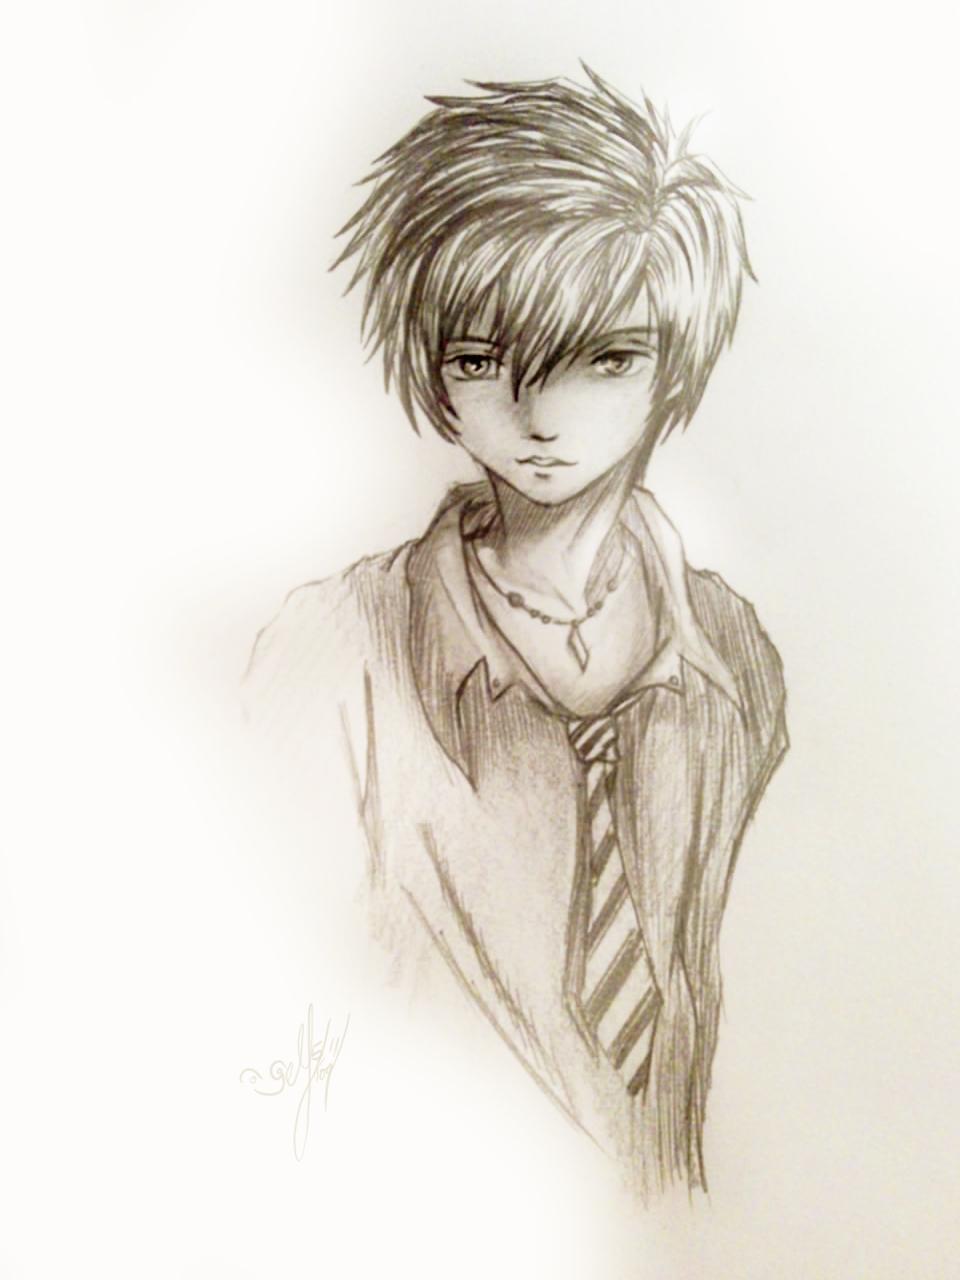 Cool boy sketch